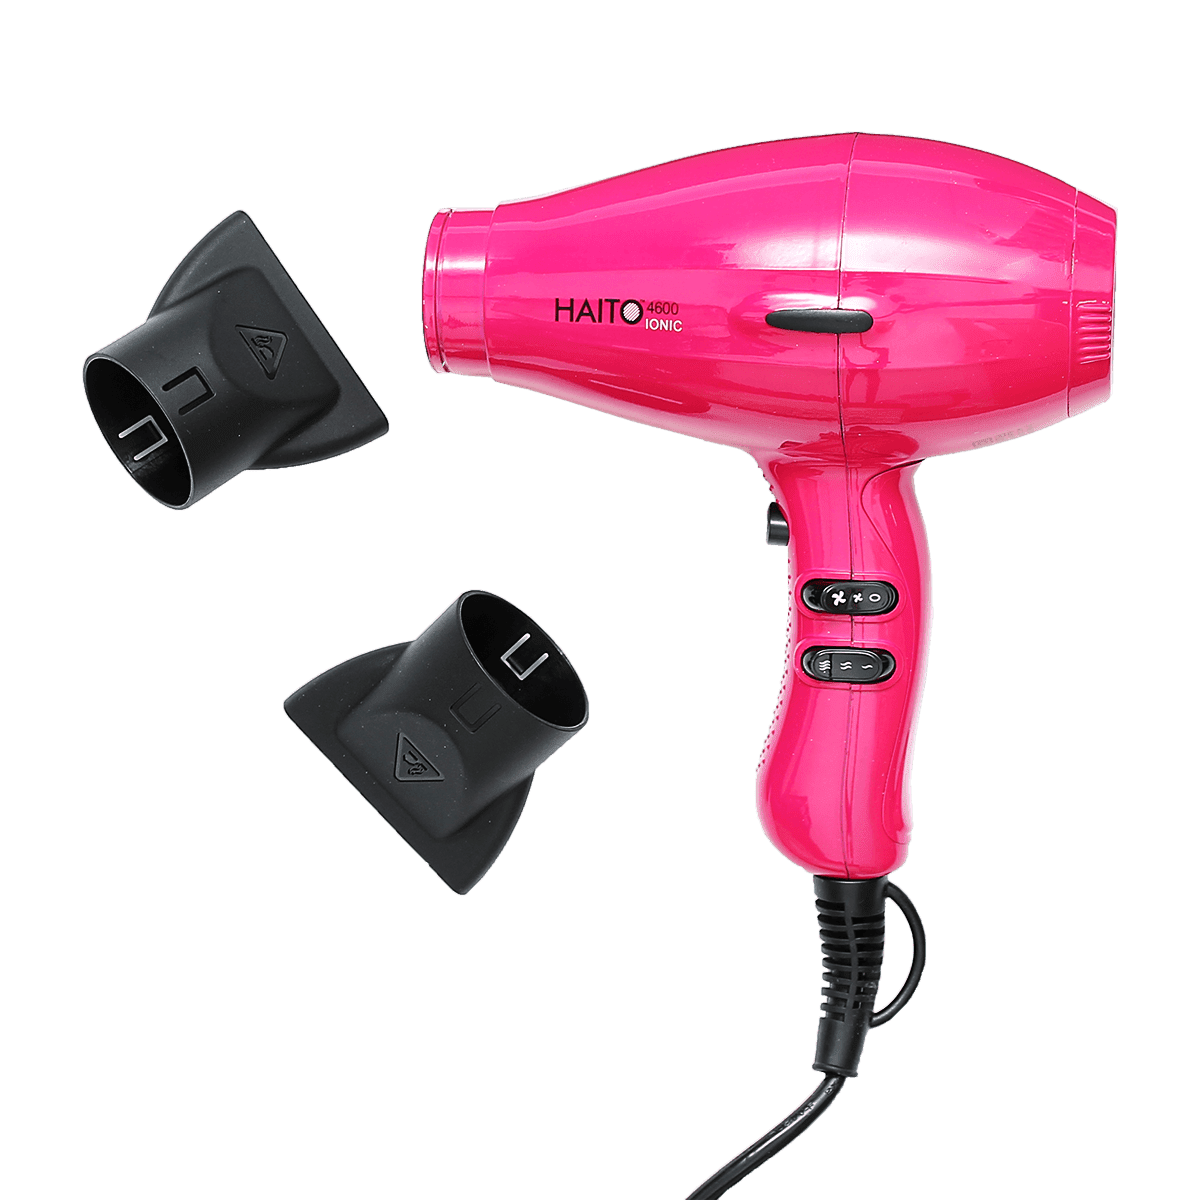 Haito 4600 Hair Dryer 2000W - Pink